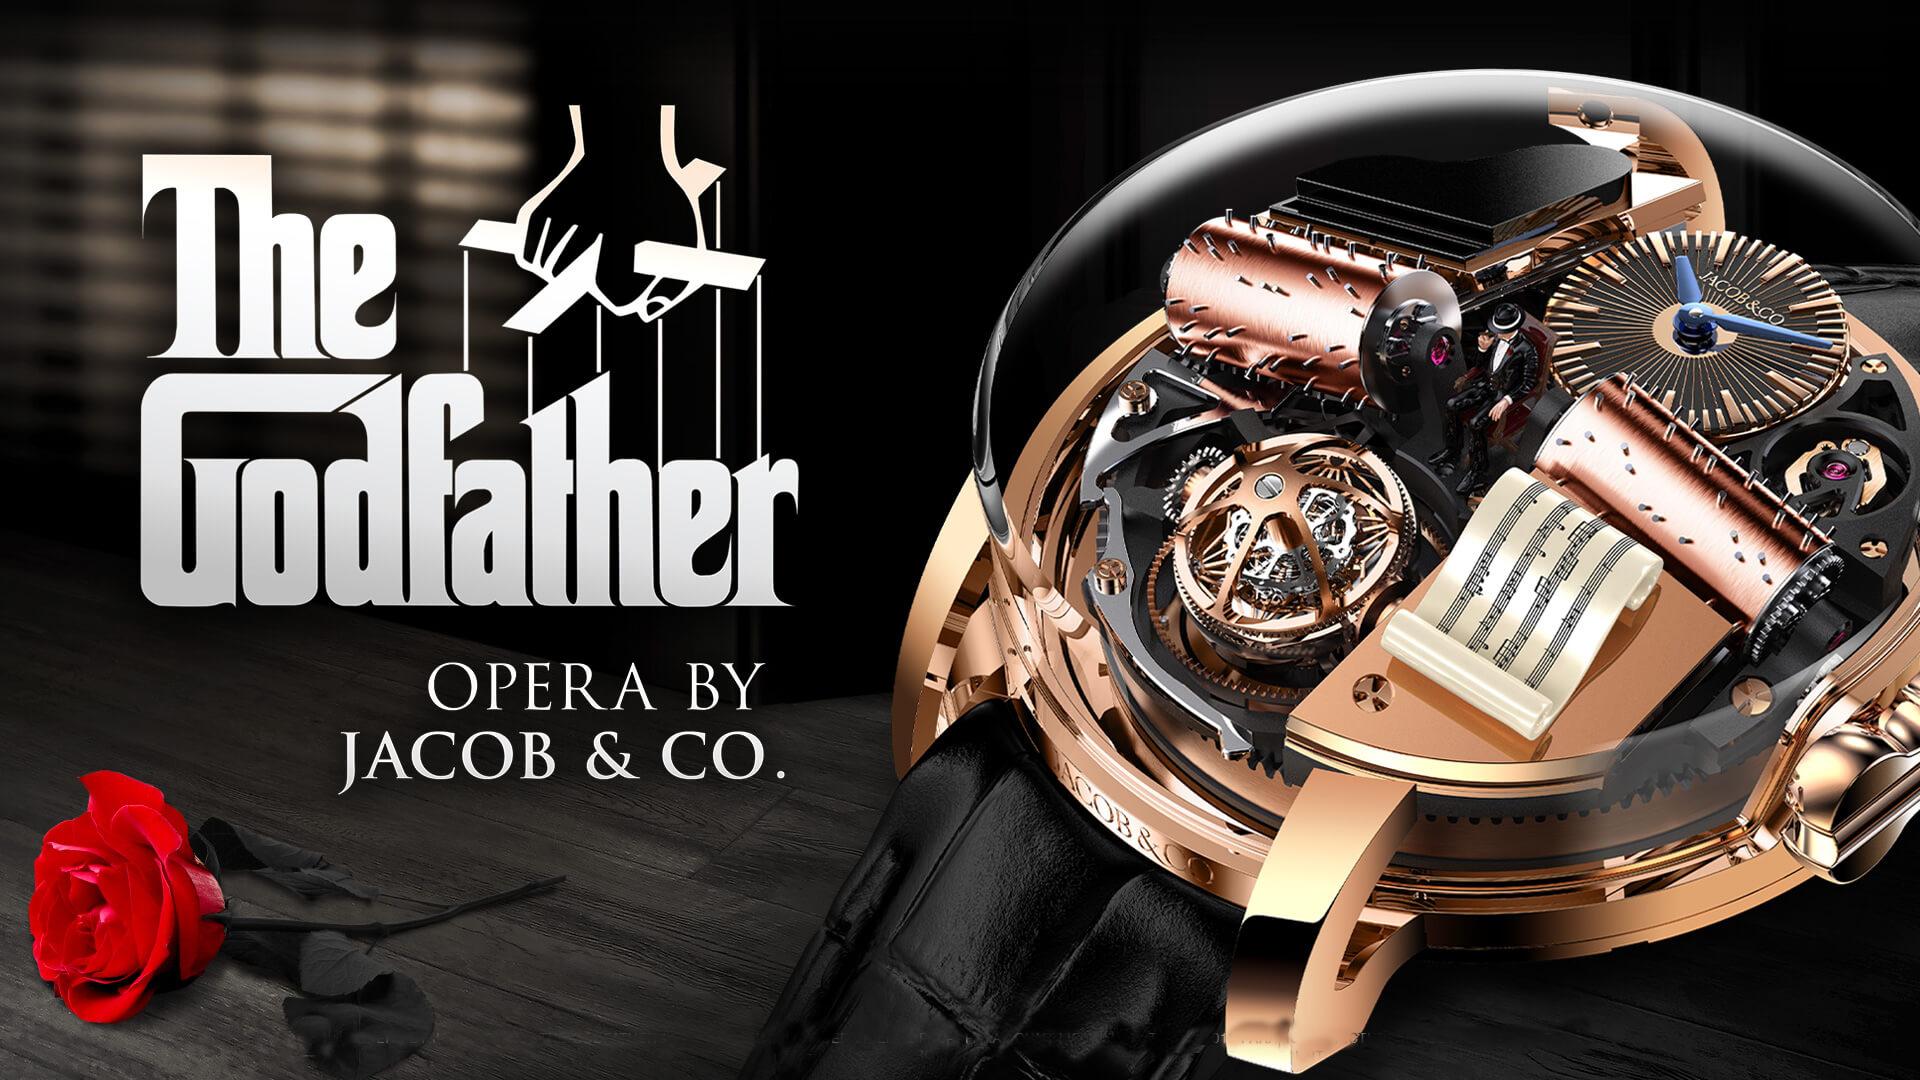 jacob-&-co-opera-godfather-edition